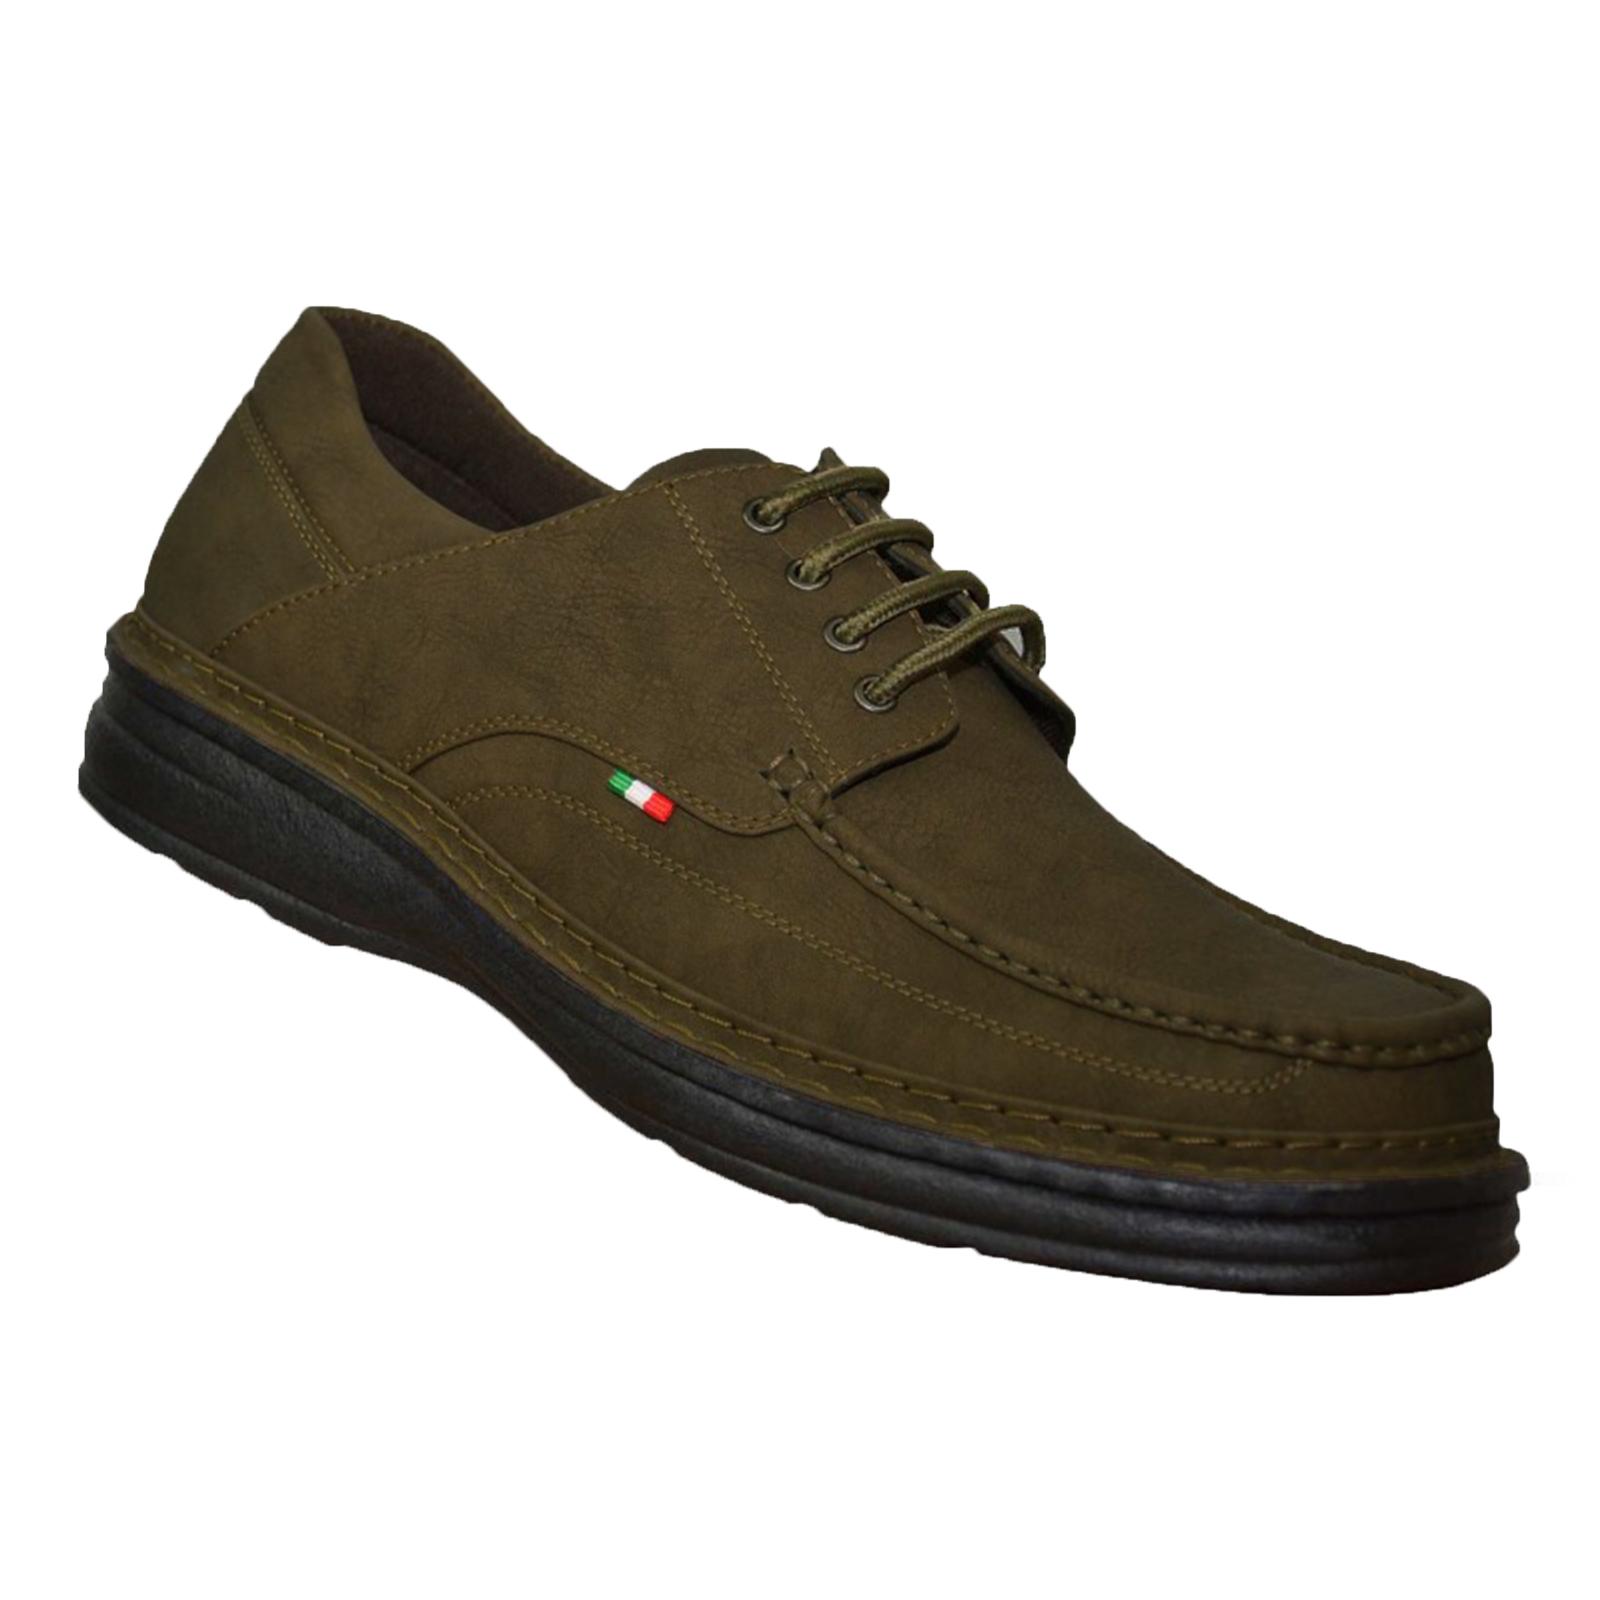 Duke-D555-Keanu-para-hombre-Big-King-Size-Zapatos-Con-Cordones-Calzado-de-Disenador-de-Cuero-PU miniatura 3